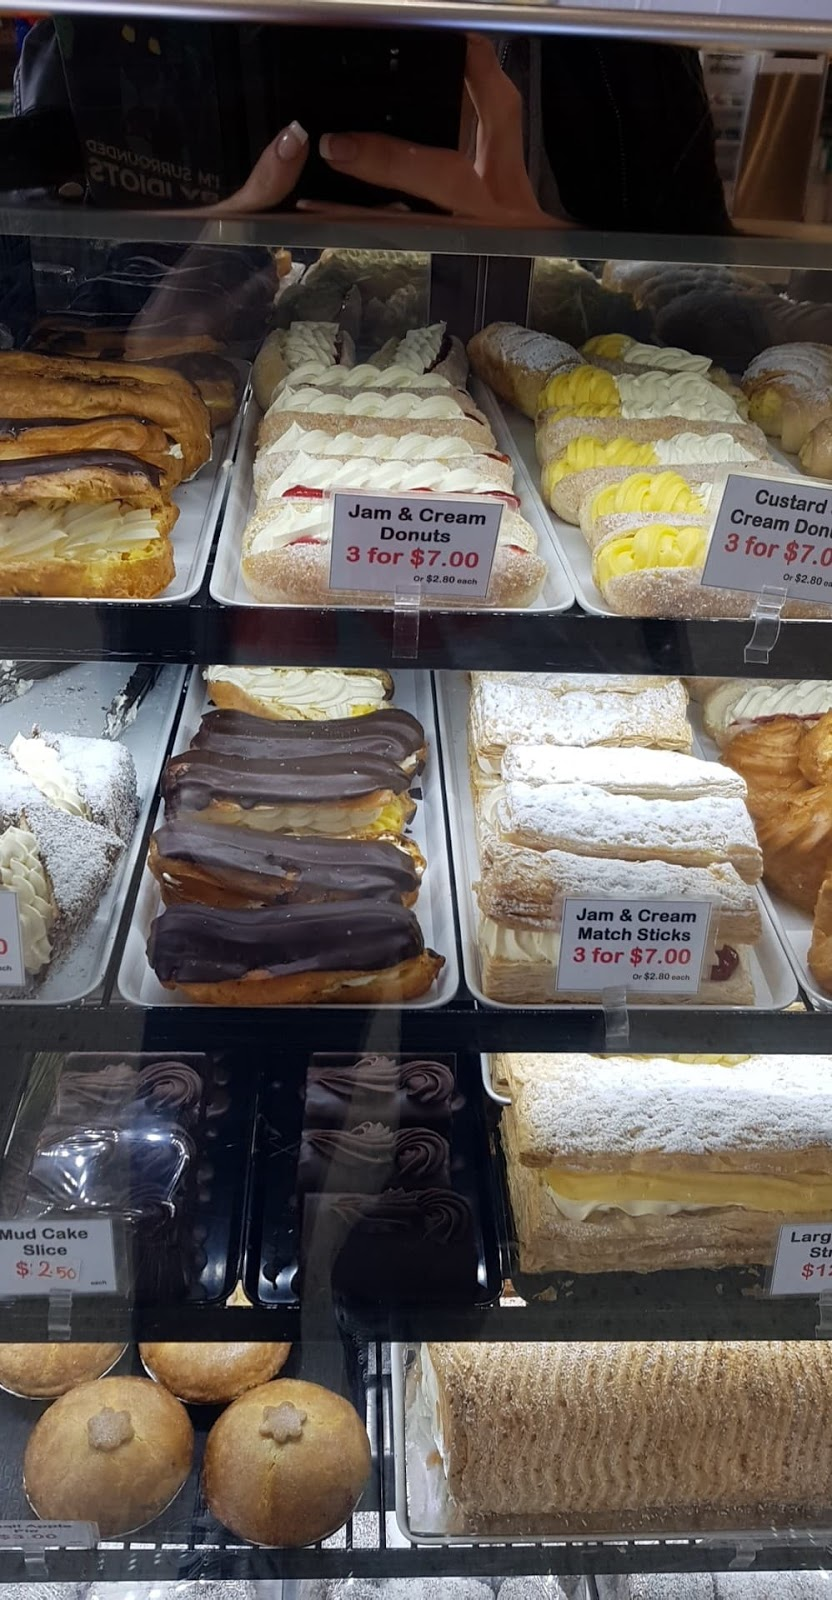 Krusty Kob Bakery | bakery | Cnr Millhouse Rd &, Egerton Dr, Aveley WA 6069, Australia | 0403300411 OR +61 403 300 411